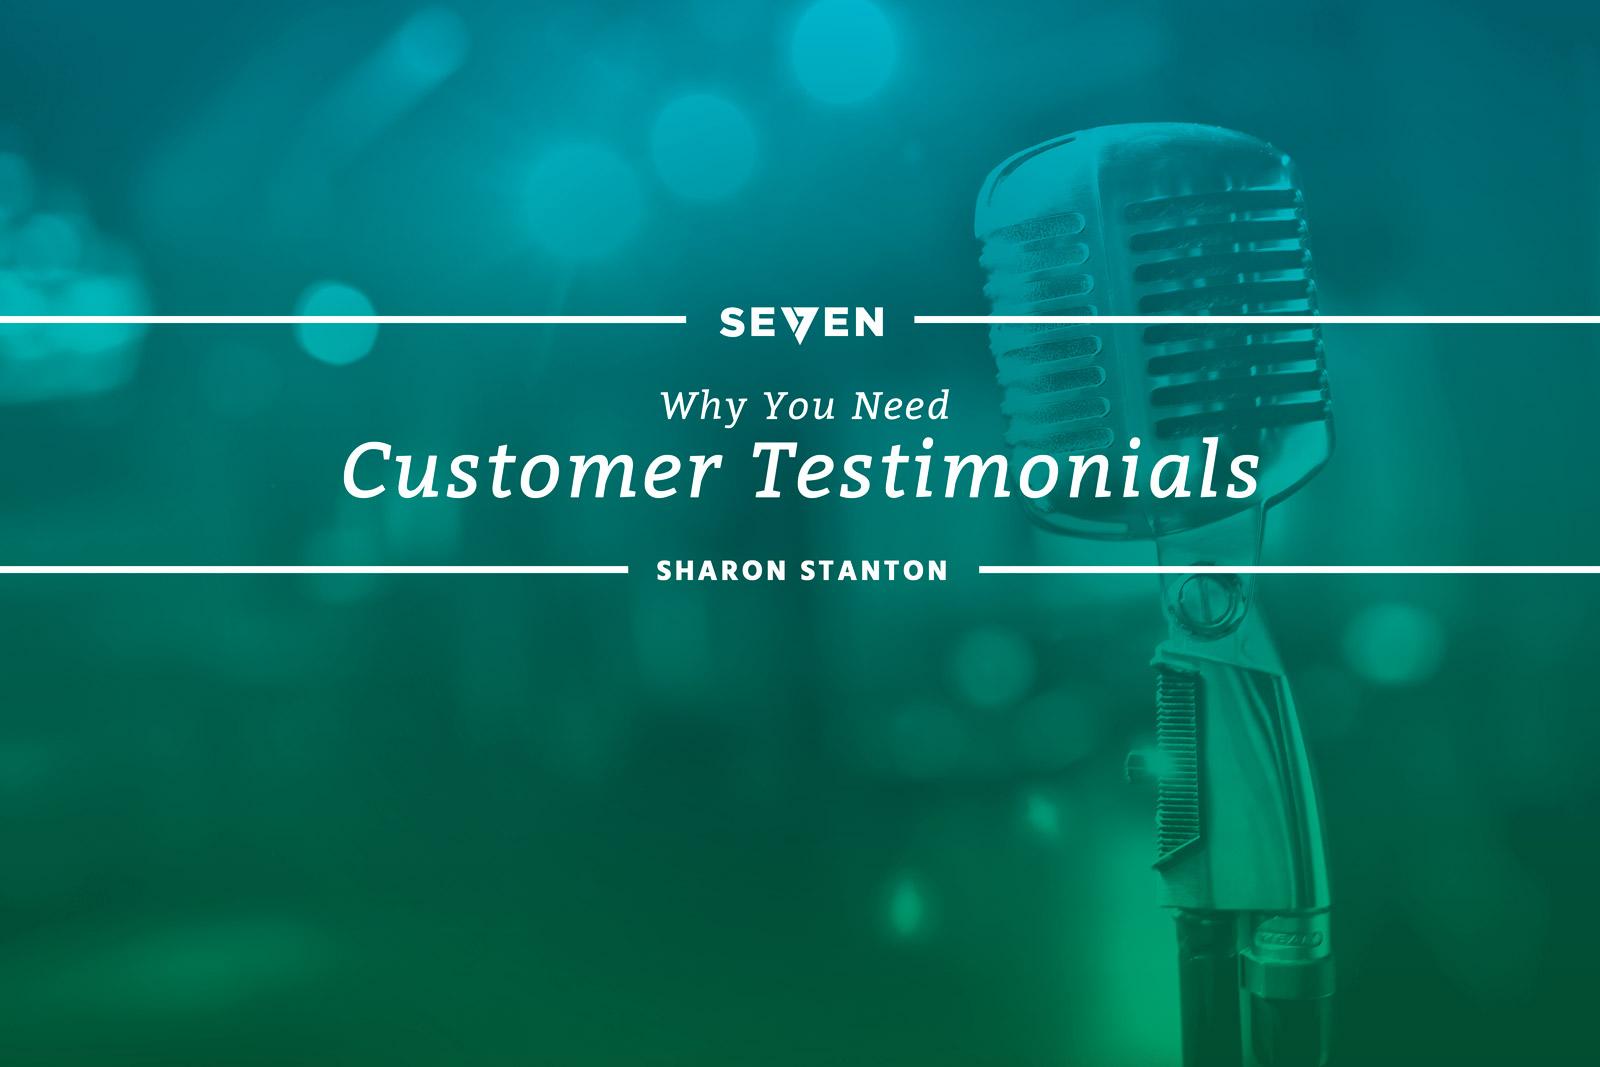 Why You Need Customer Testimonials